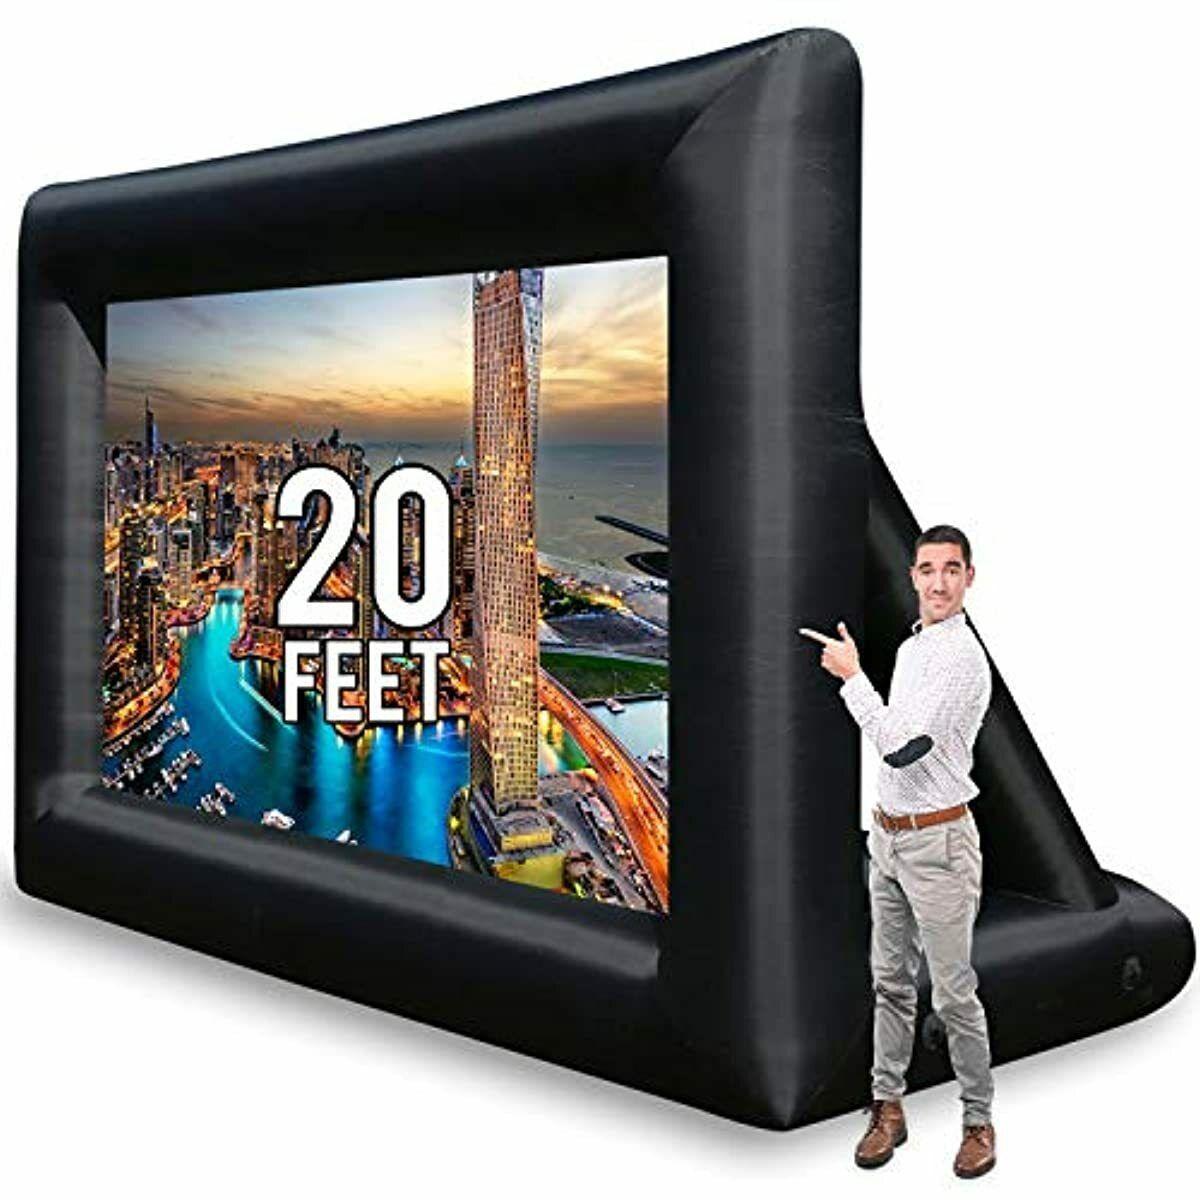 2o feet outdoor party mega large tv